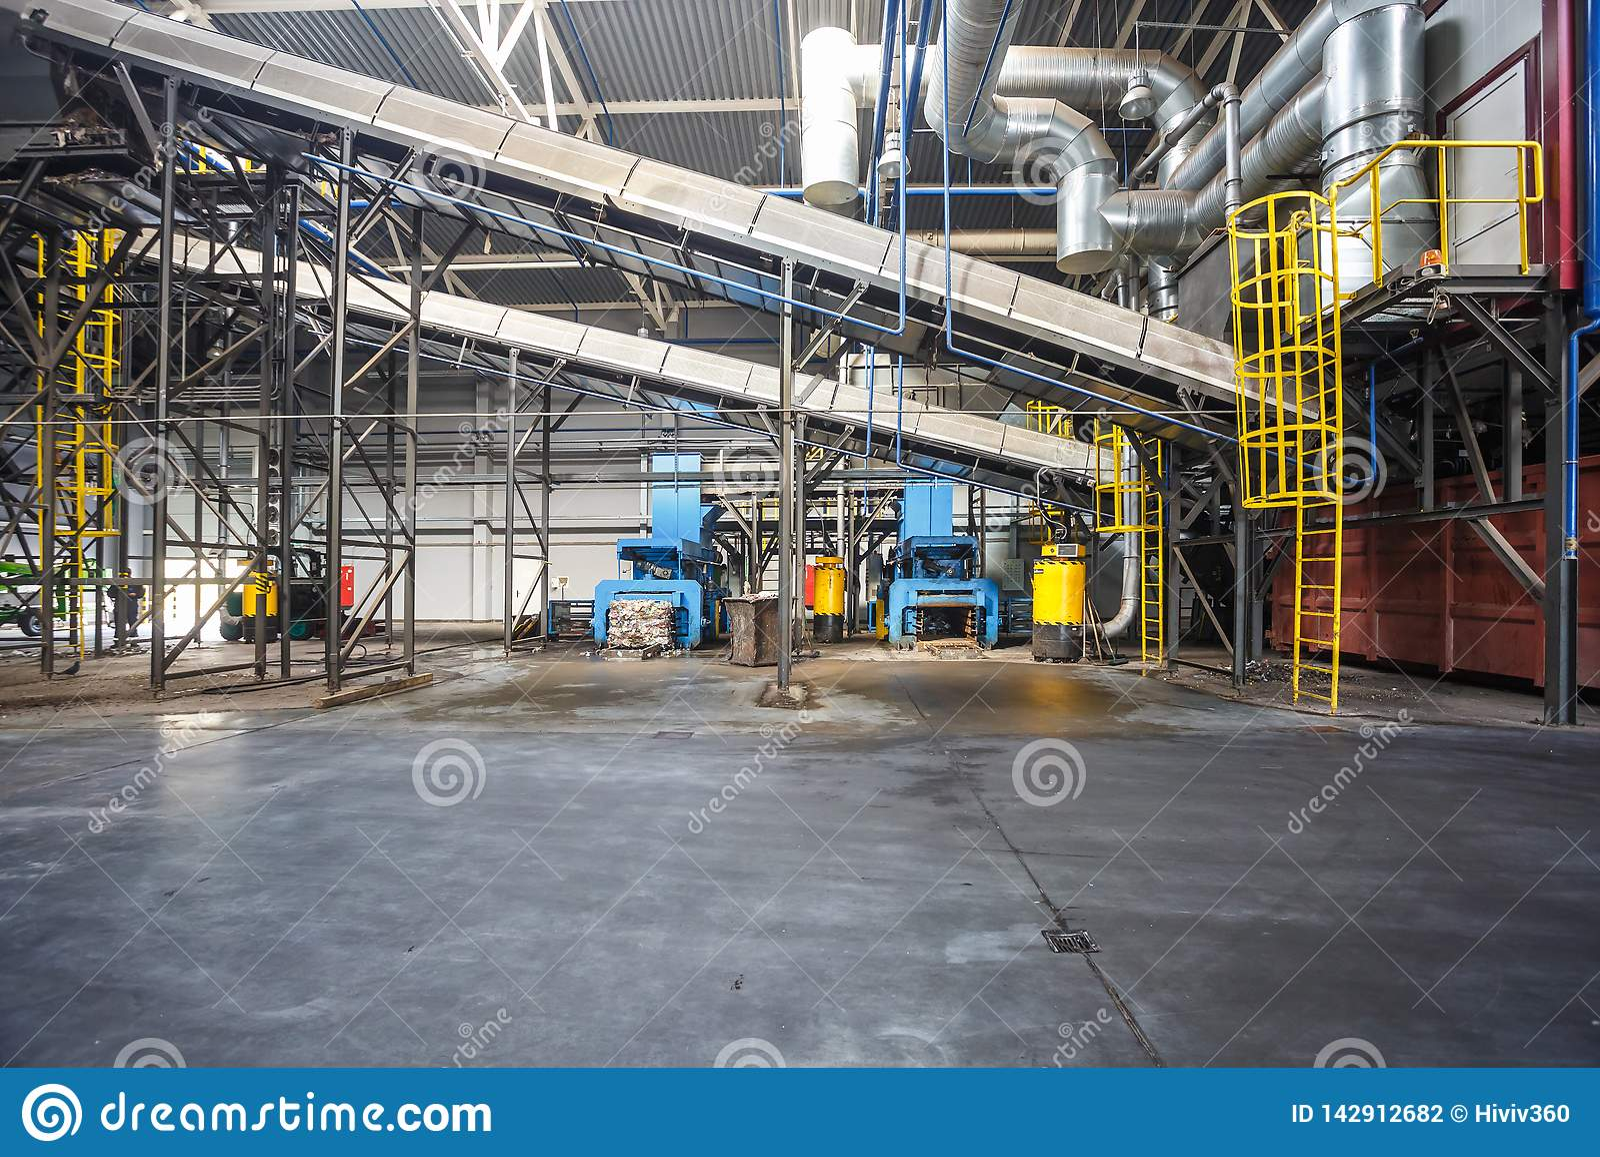 транспортеры на заводе